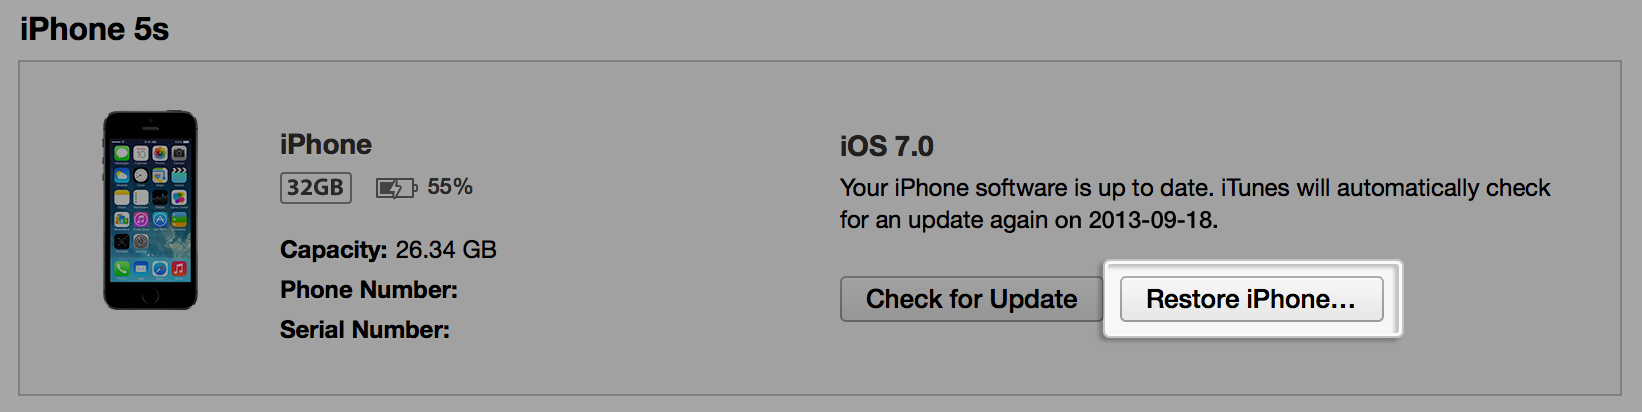 「iPhoneを復元」をクリック